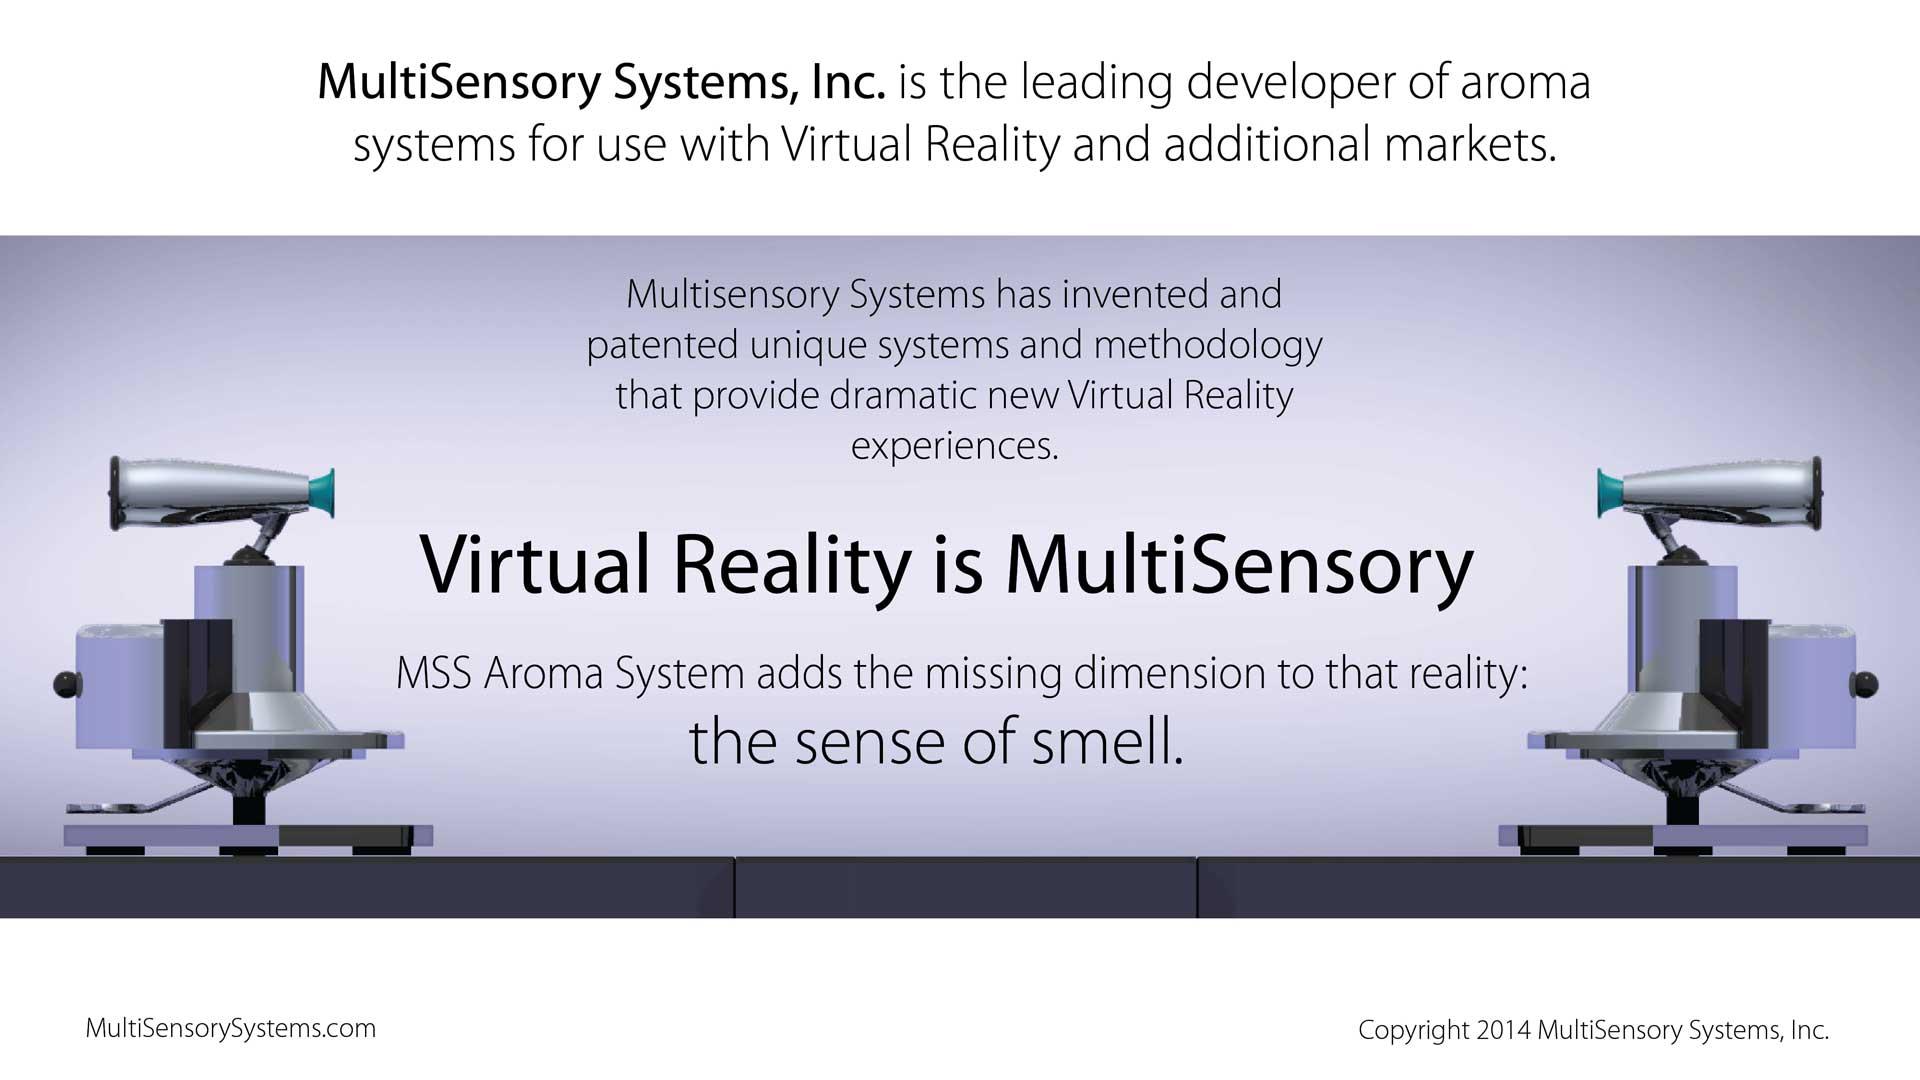 Virtual Reality is Multisensory